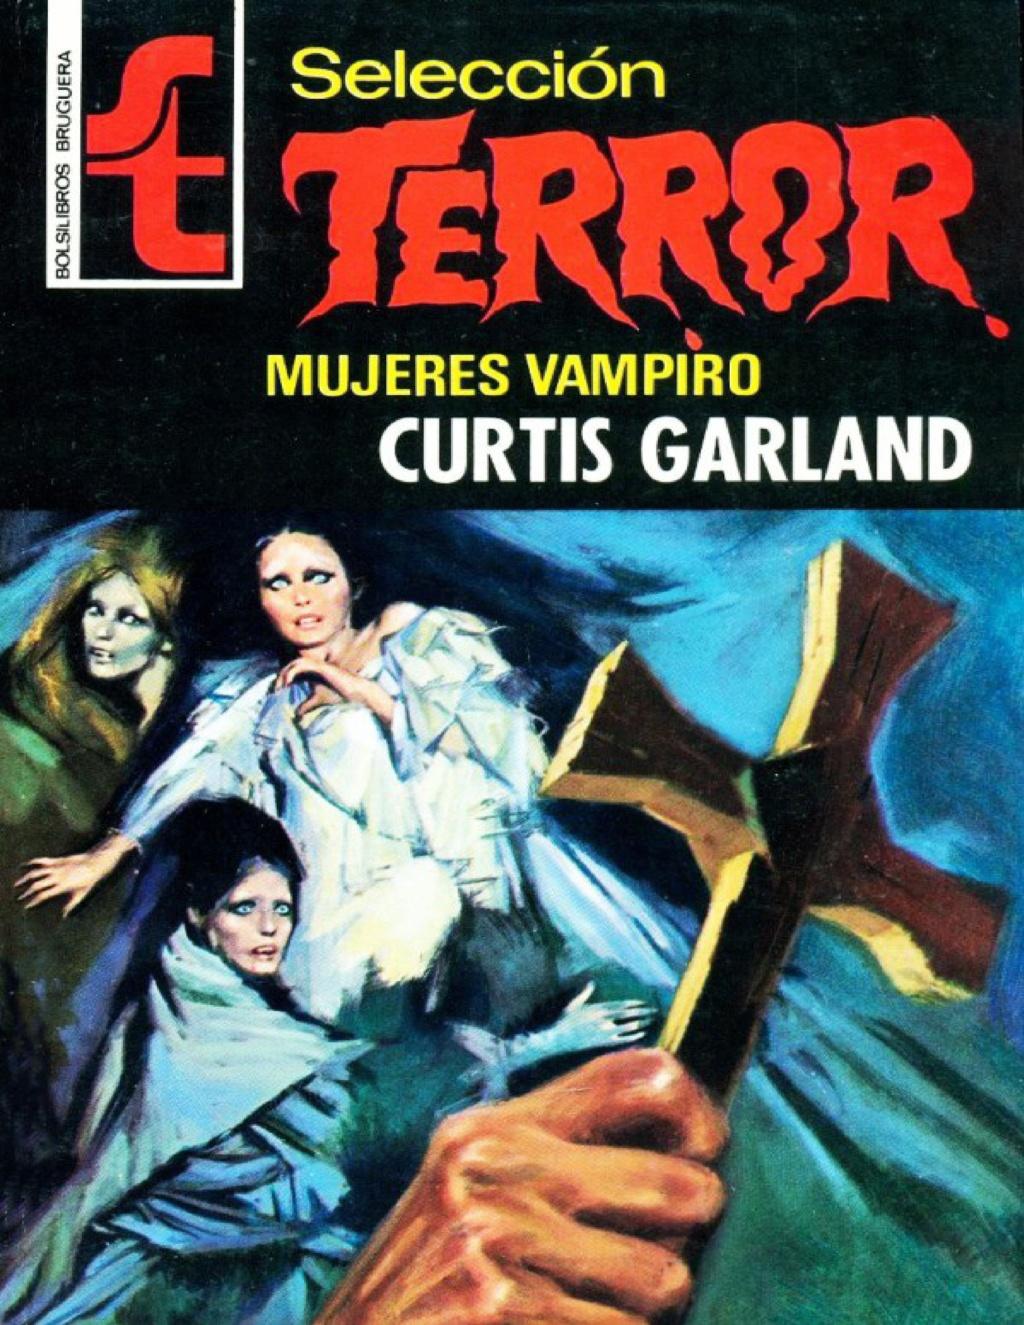 Seleccion Terror 006 Mujeres Vampiro (Curtis Garland) Page-014